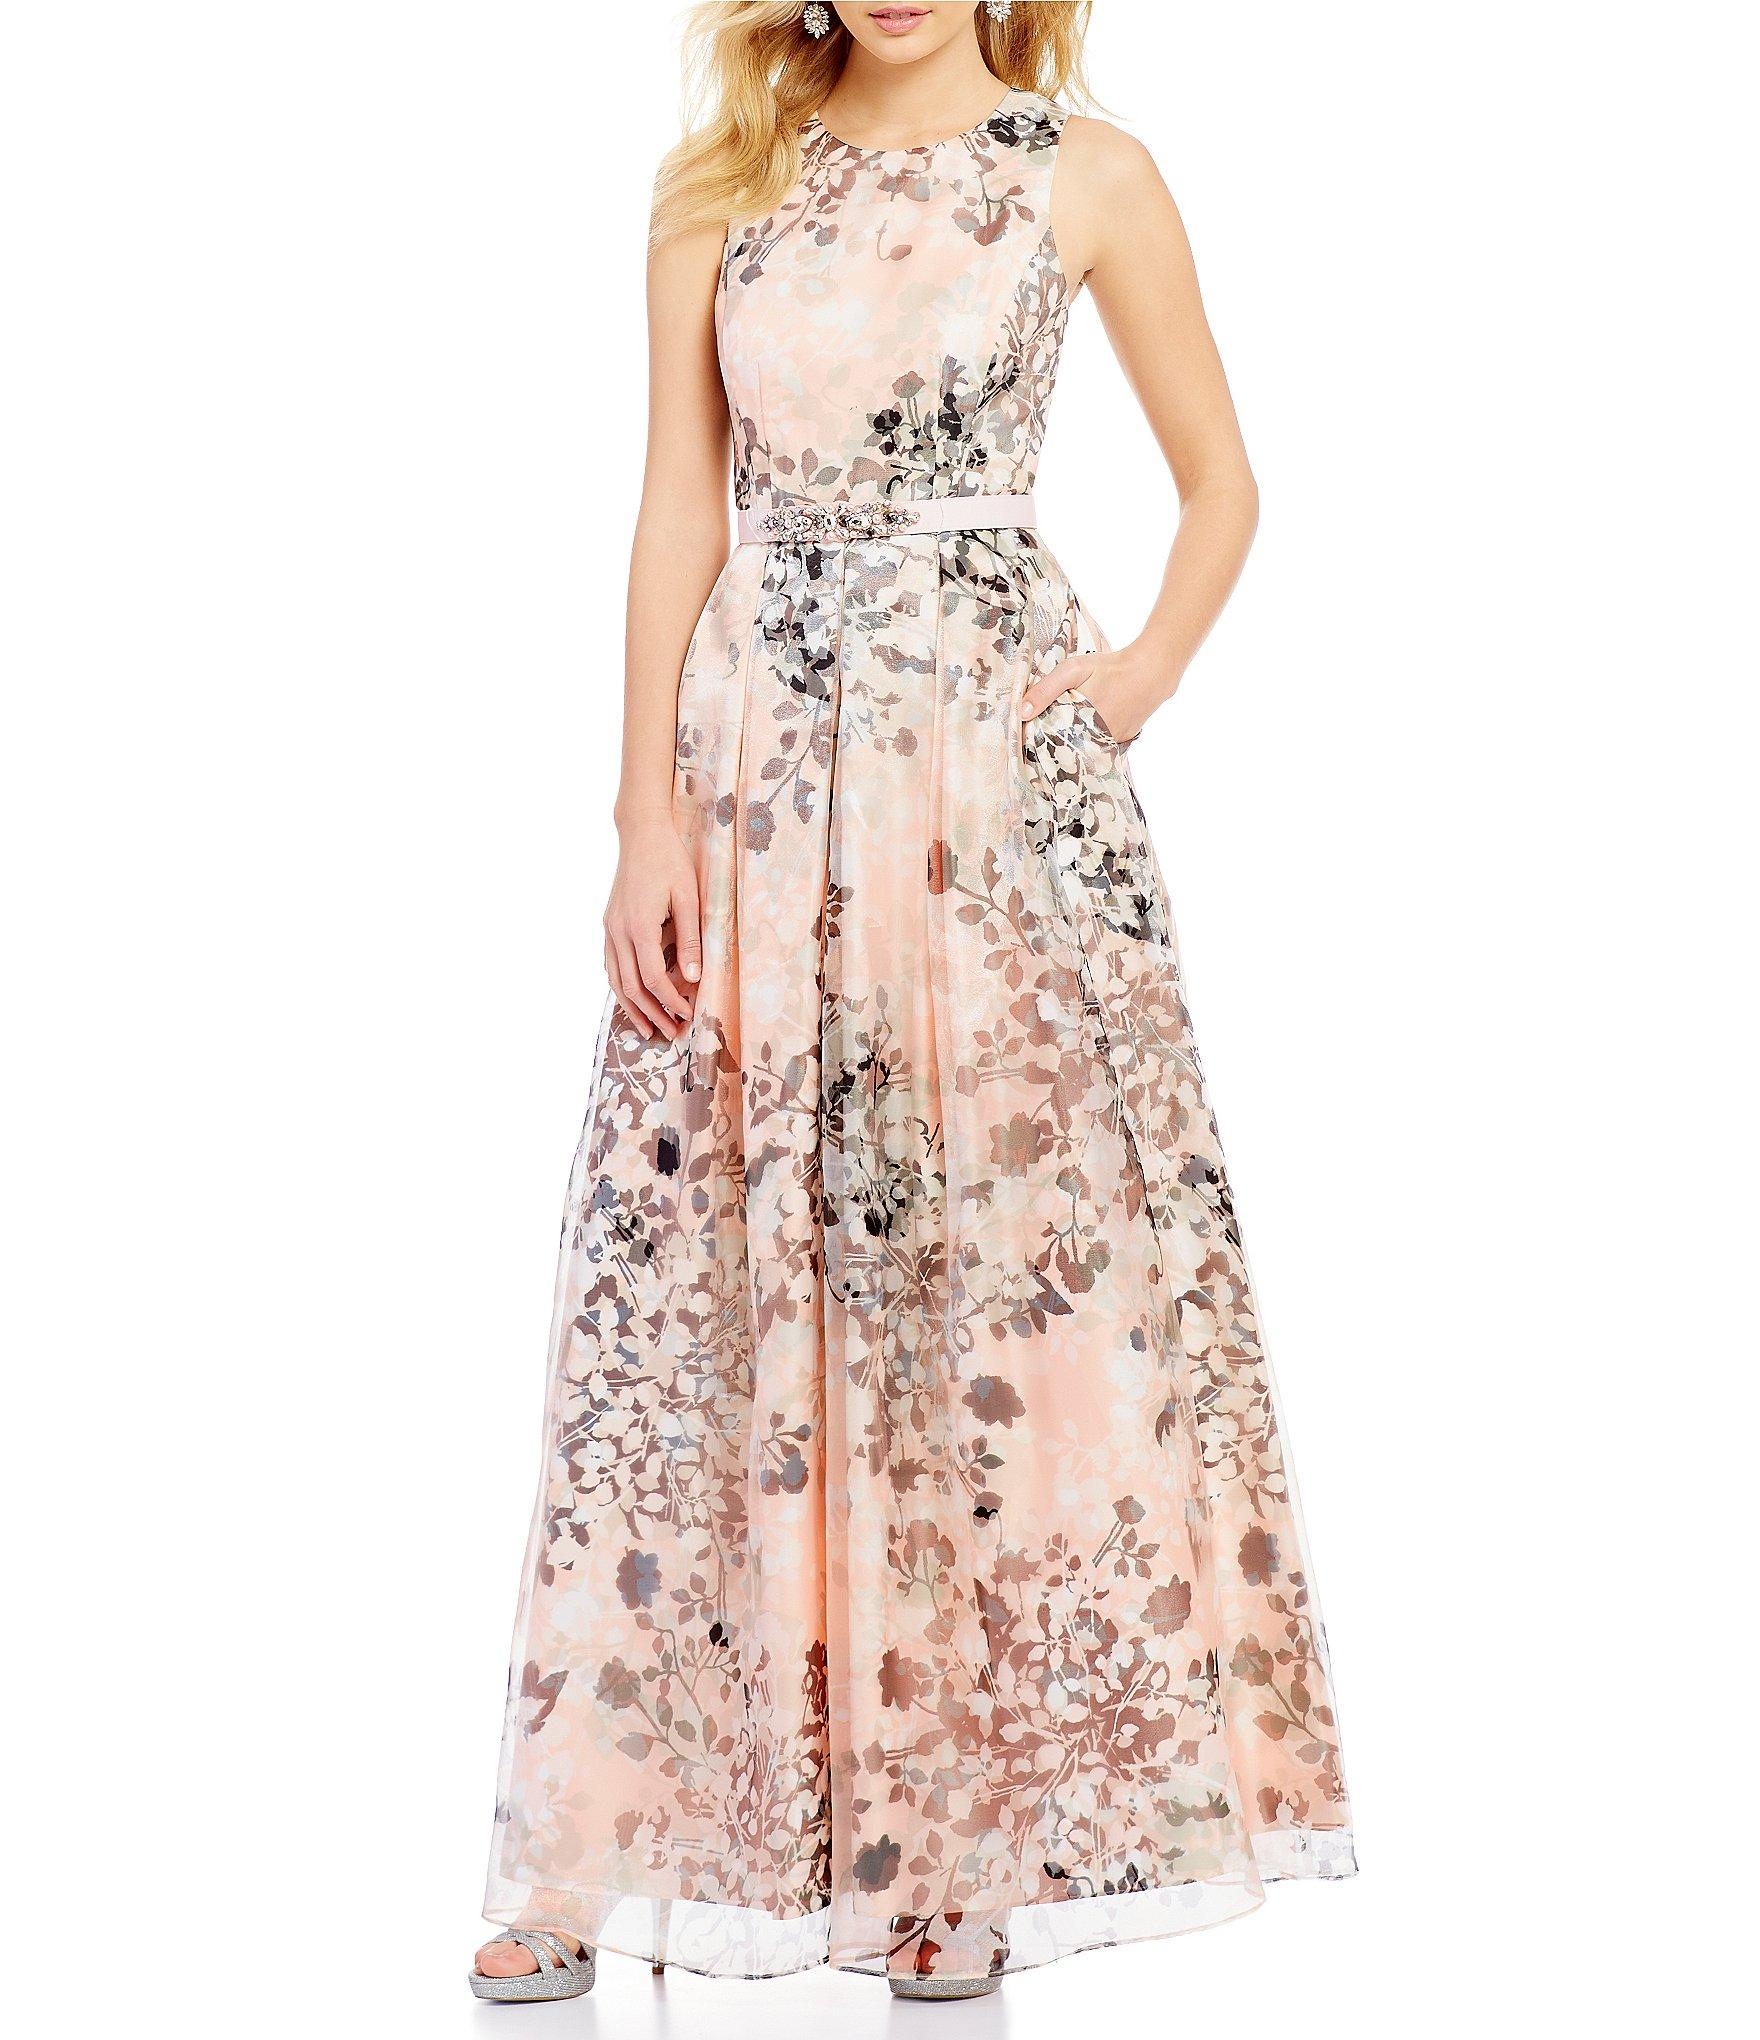 cd4b8021c0 Eliza J Round Neck Sleeveless Floral Organza Pleated Ballgown in ...